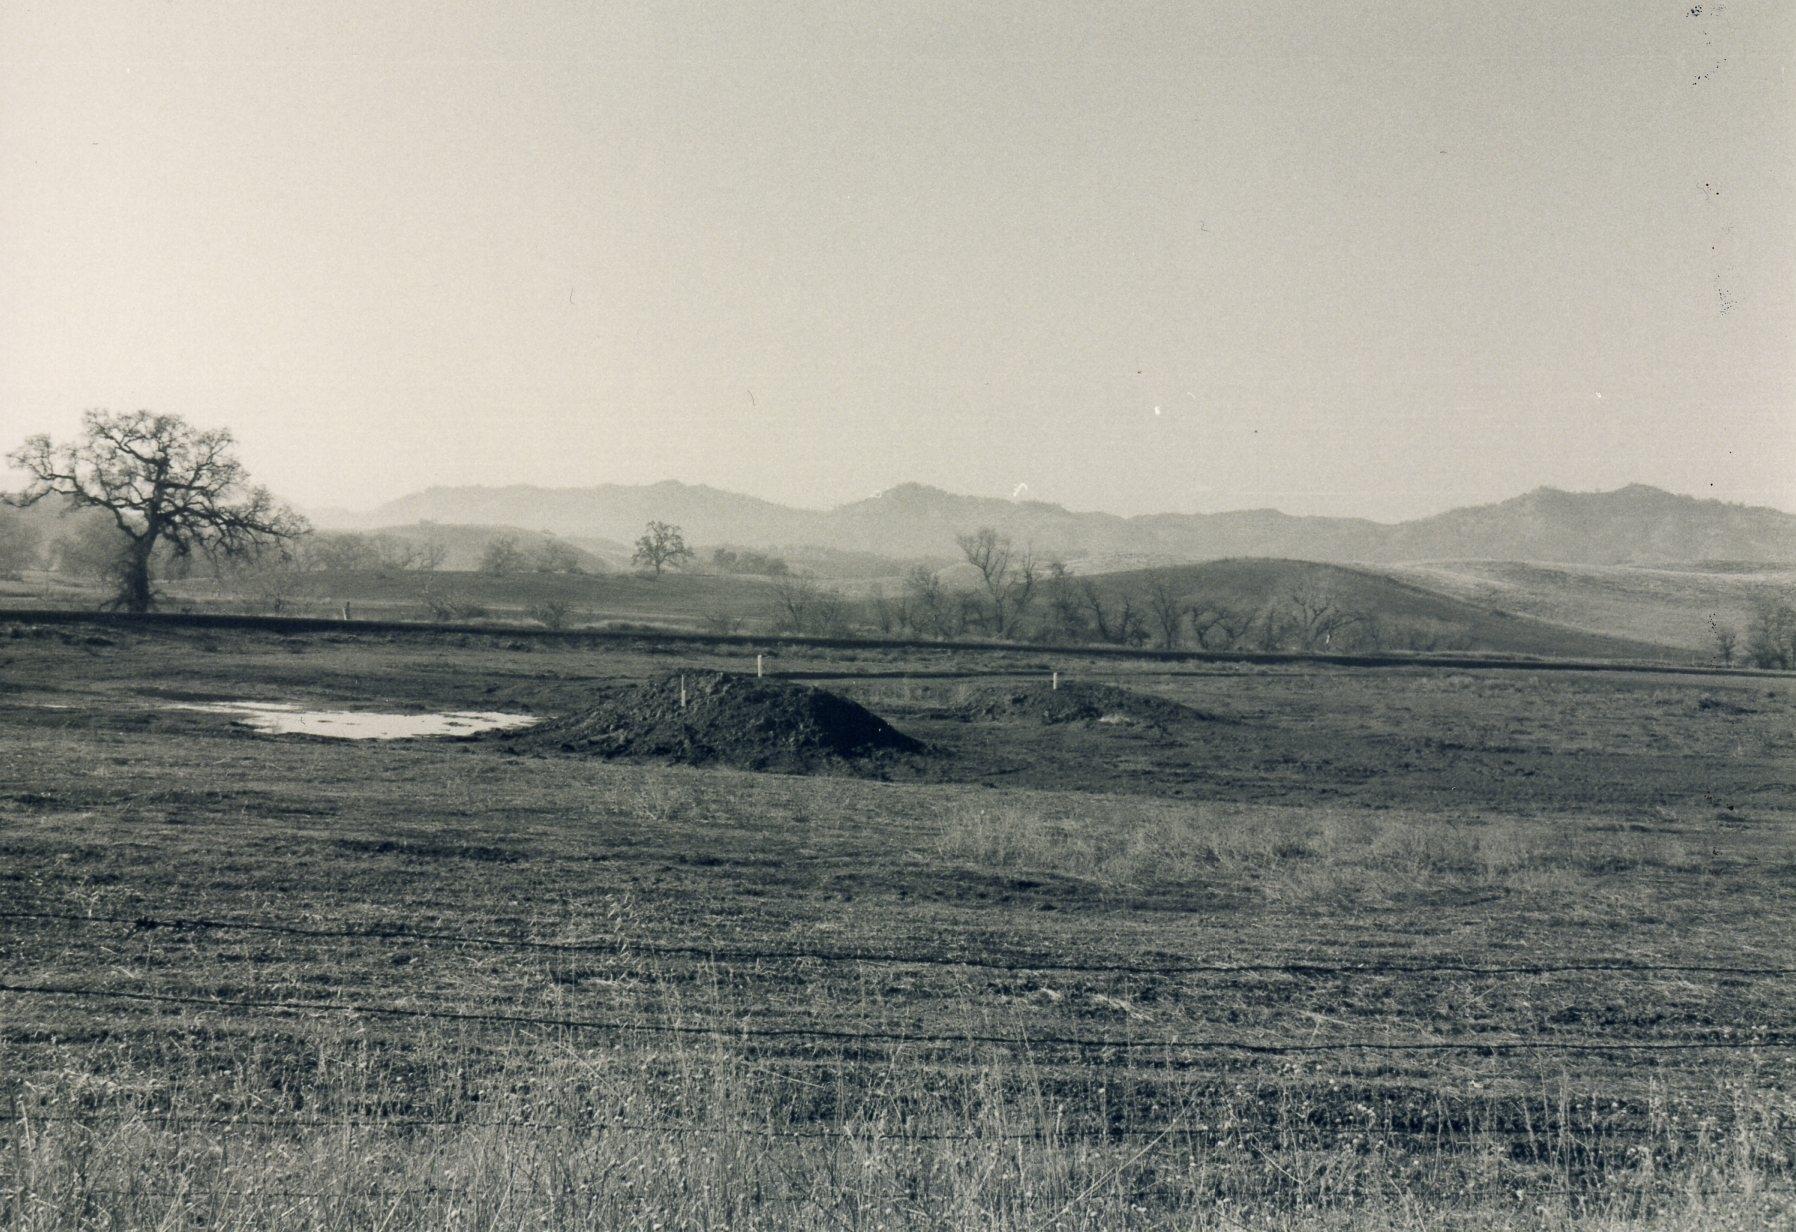 Western wetlands under construction, 1997